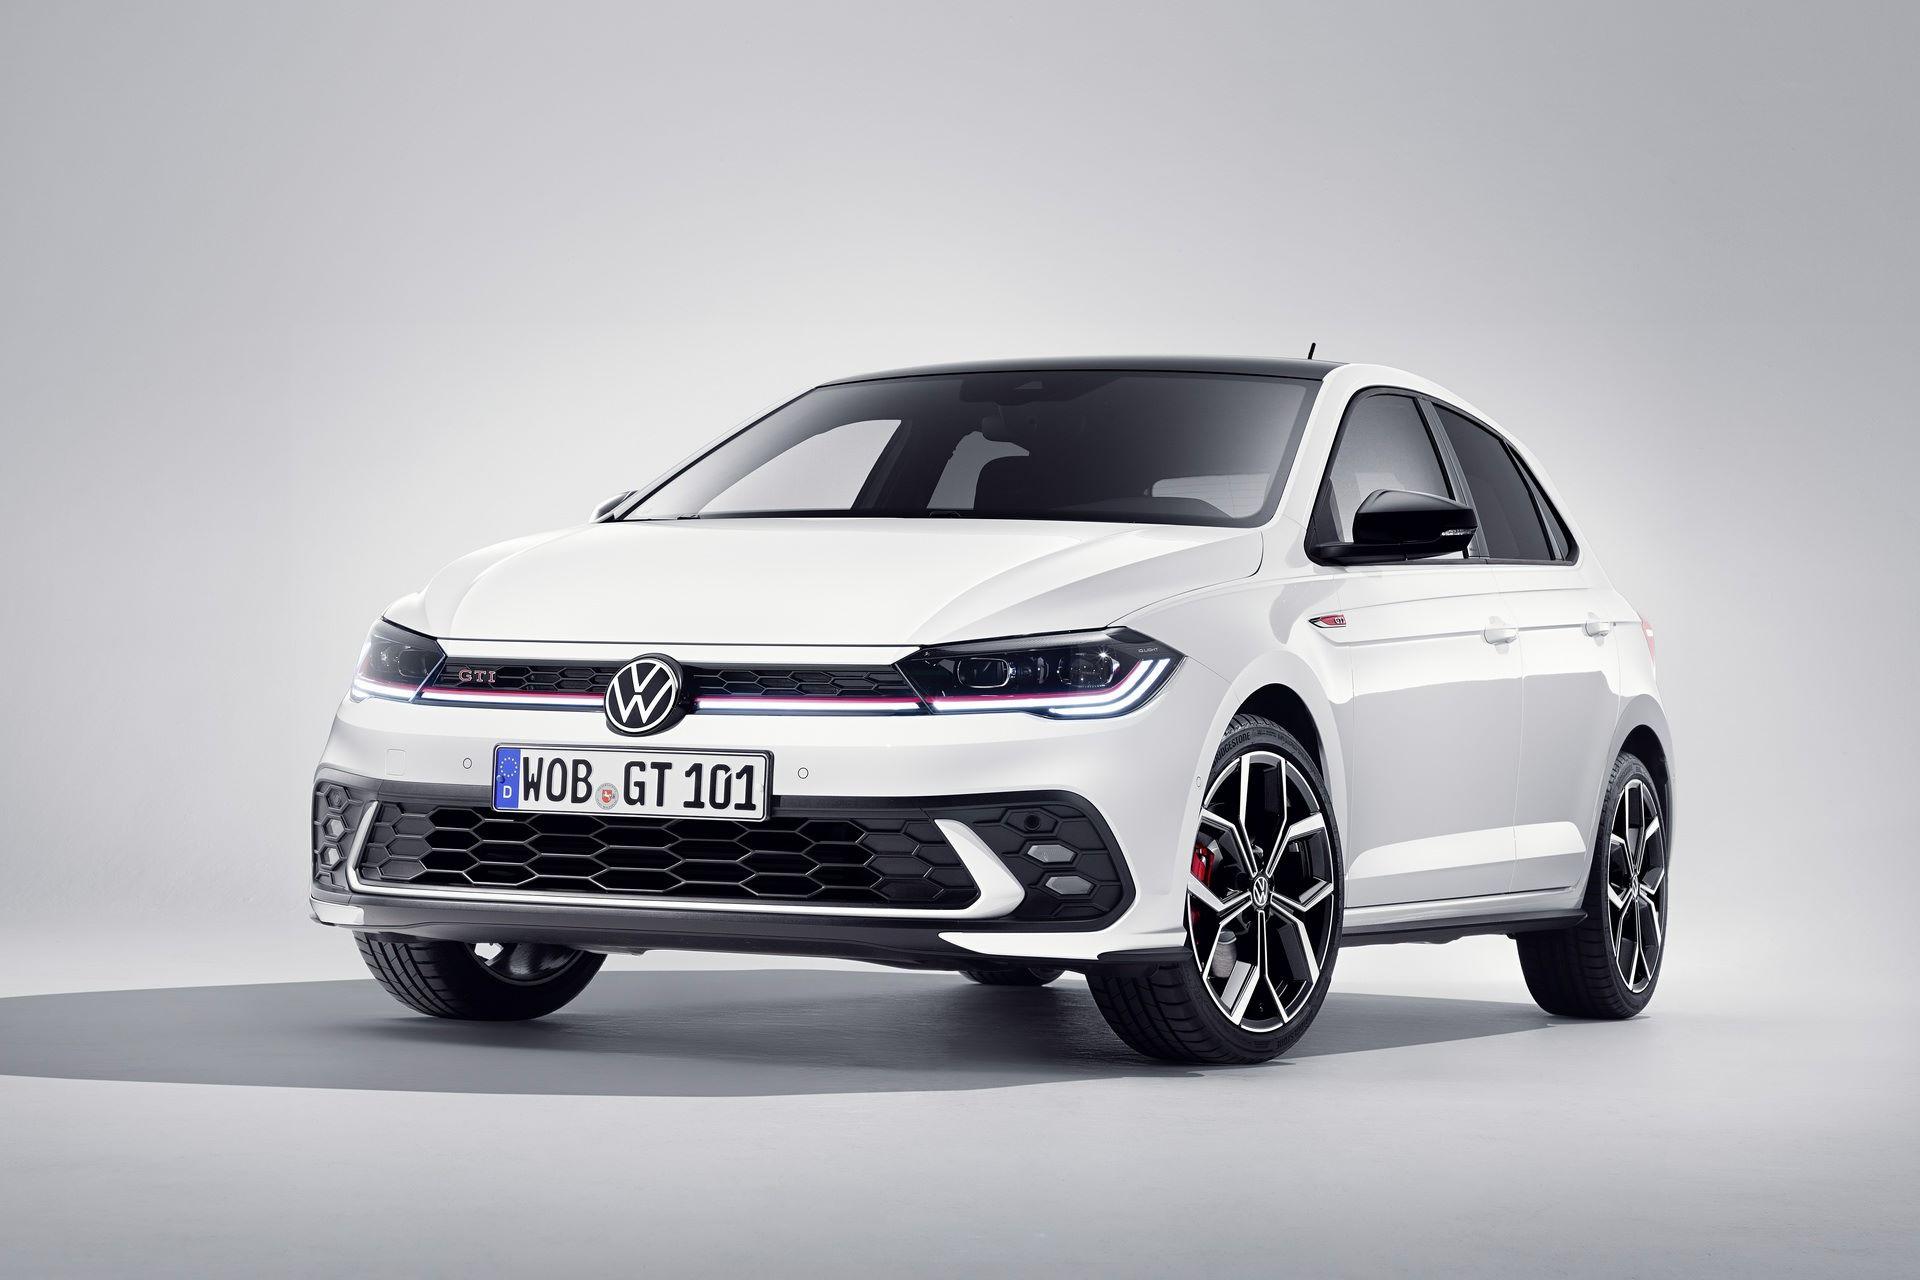 VW-Polo-GTI-facelift-1